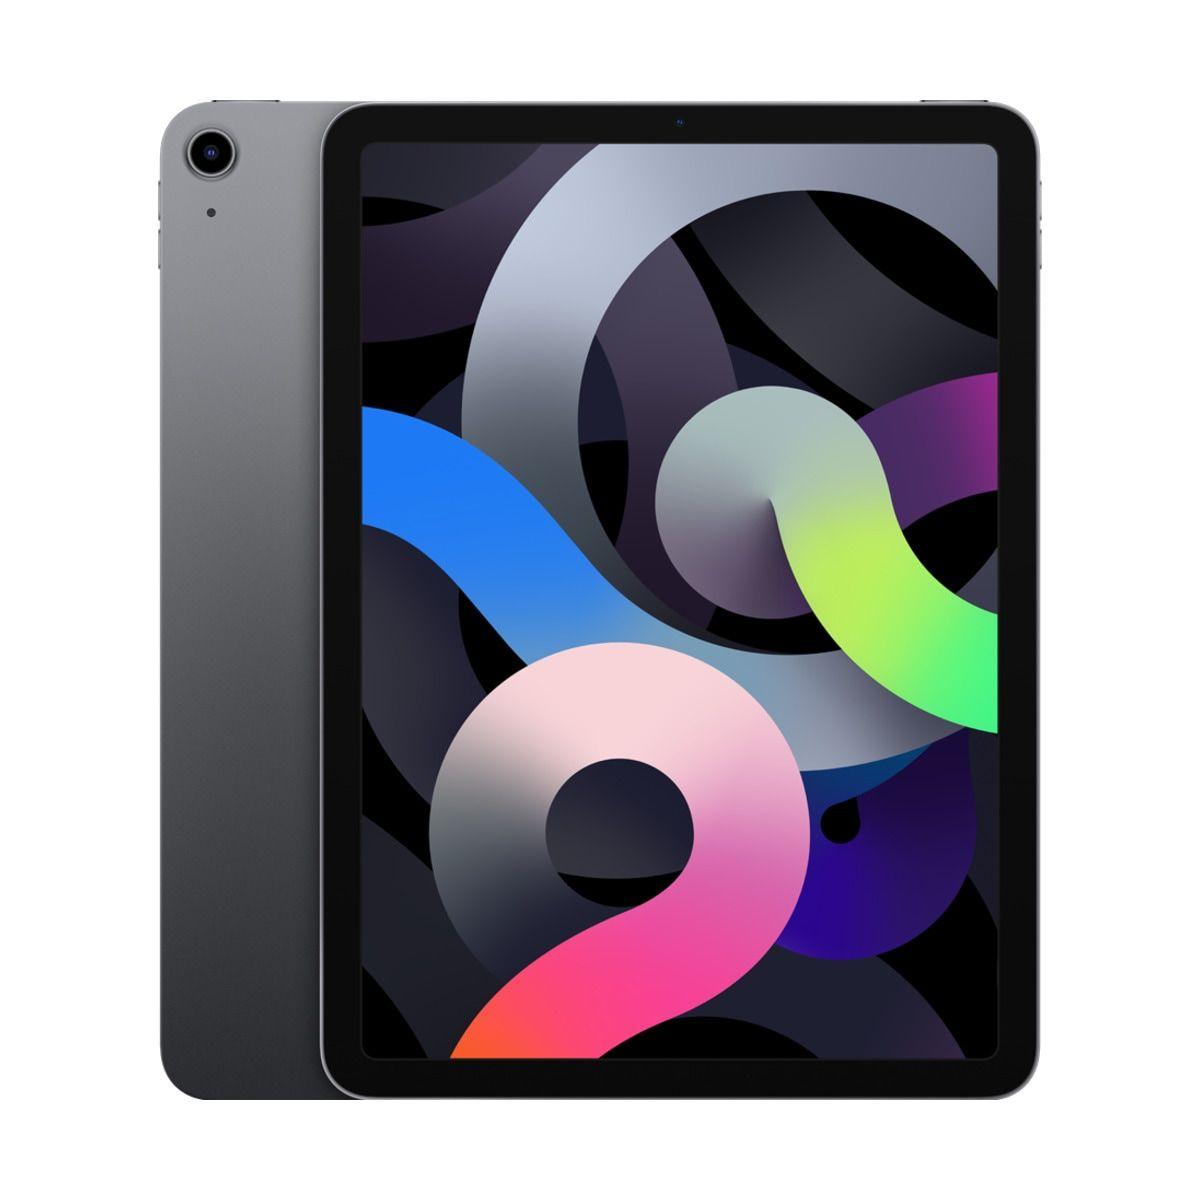 Apple iPad Air Wi-Fi + Cell 256GB - Space Grey / SK